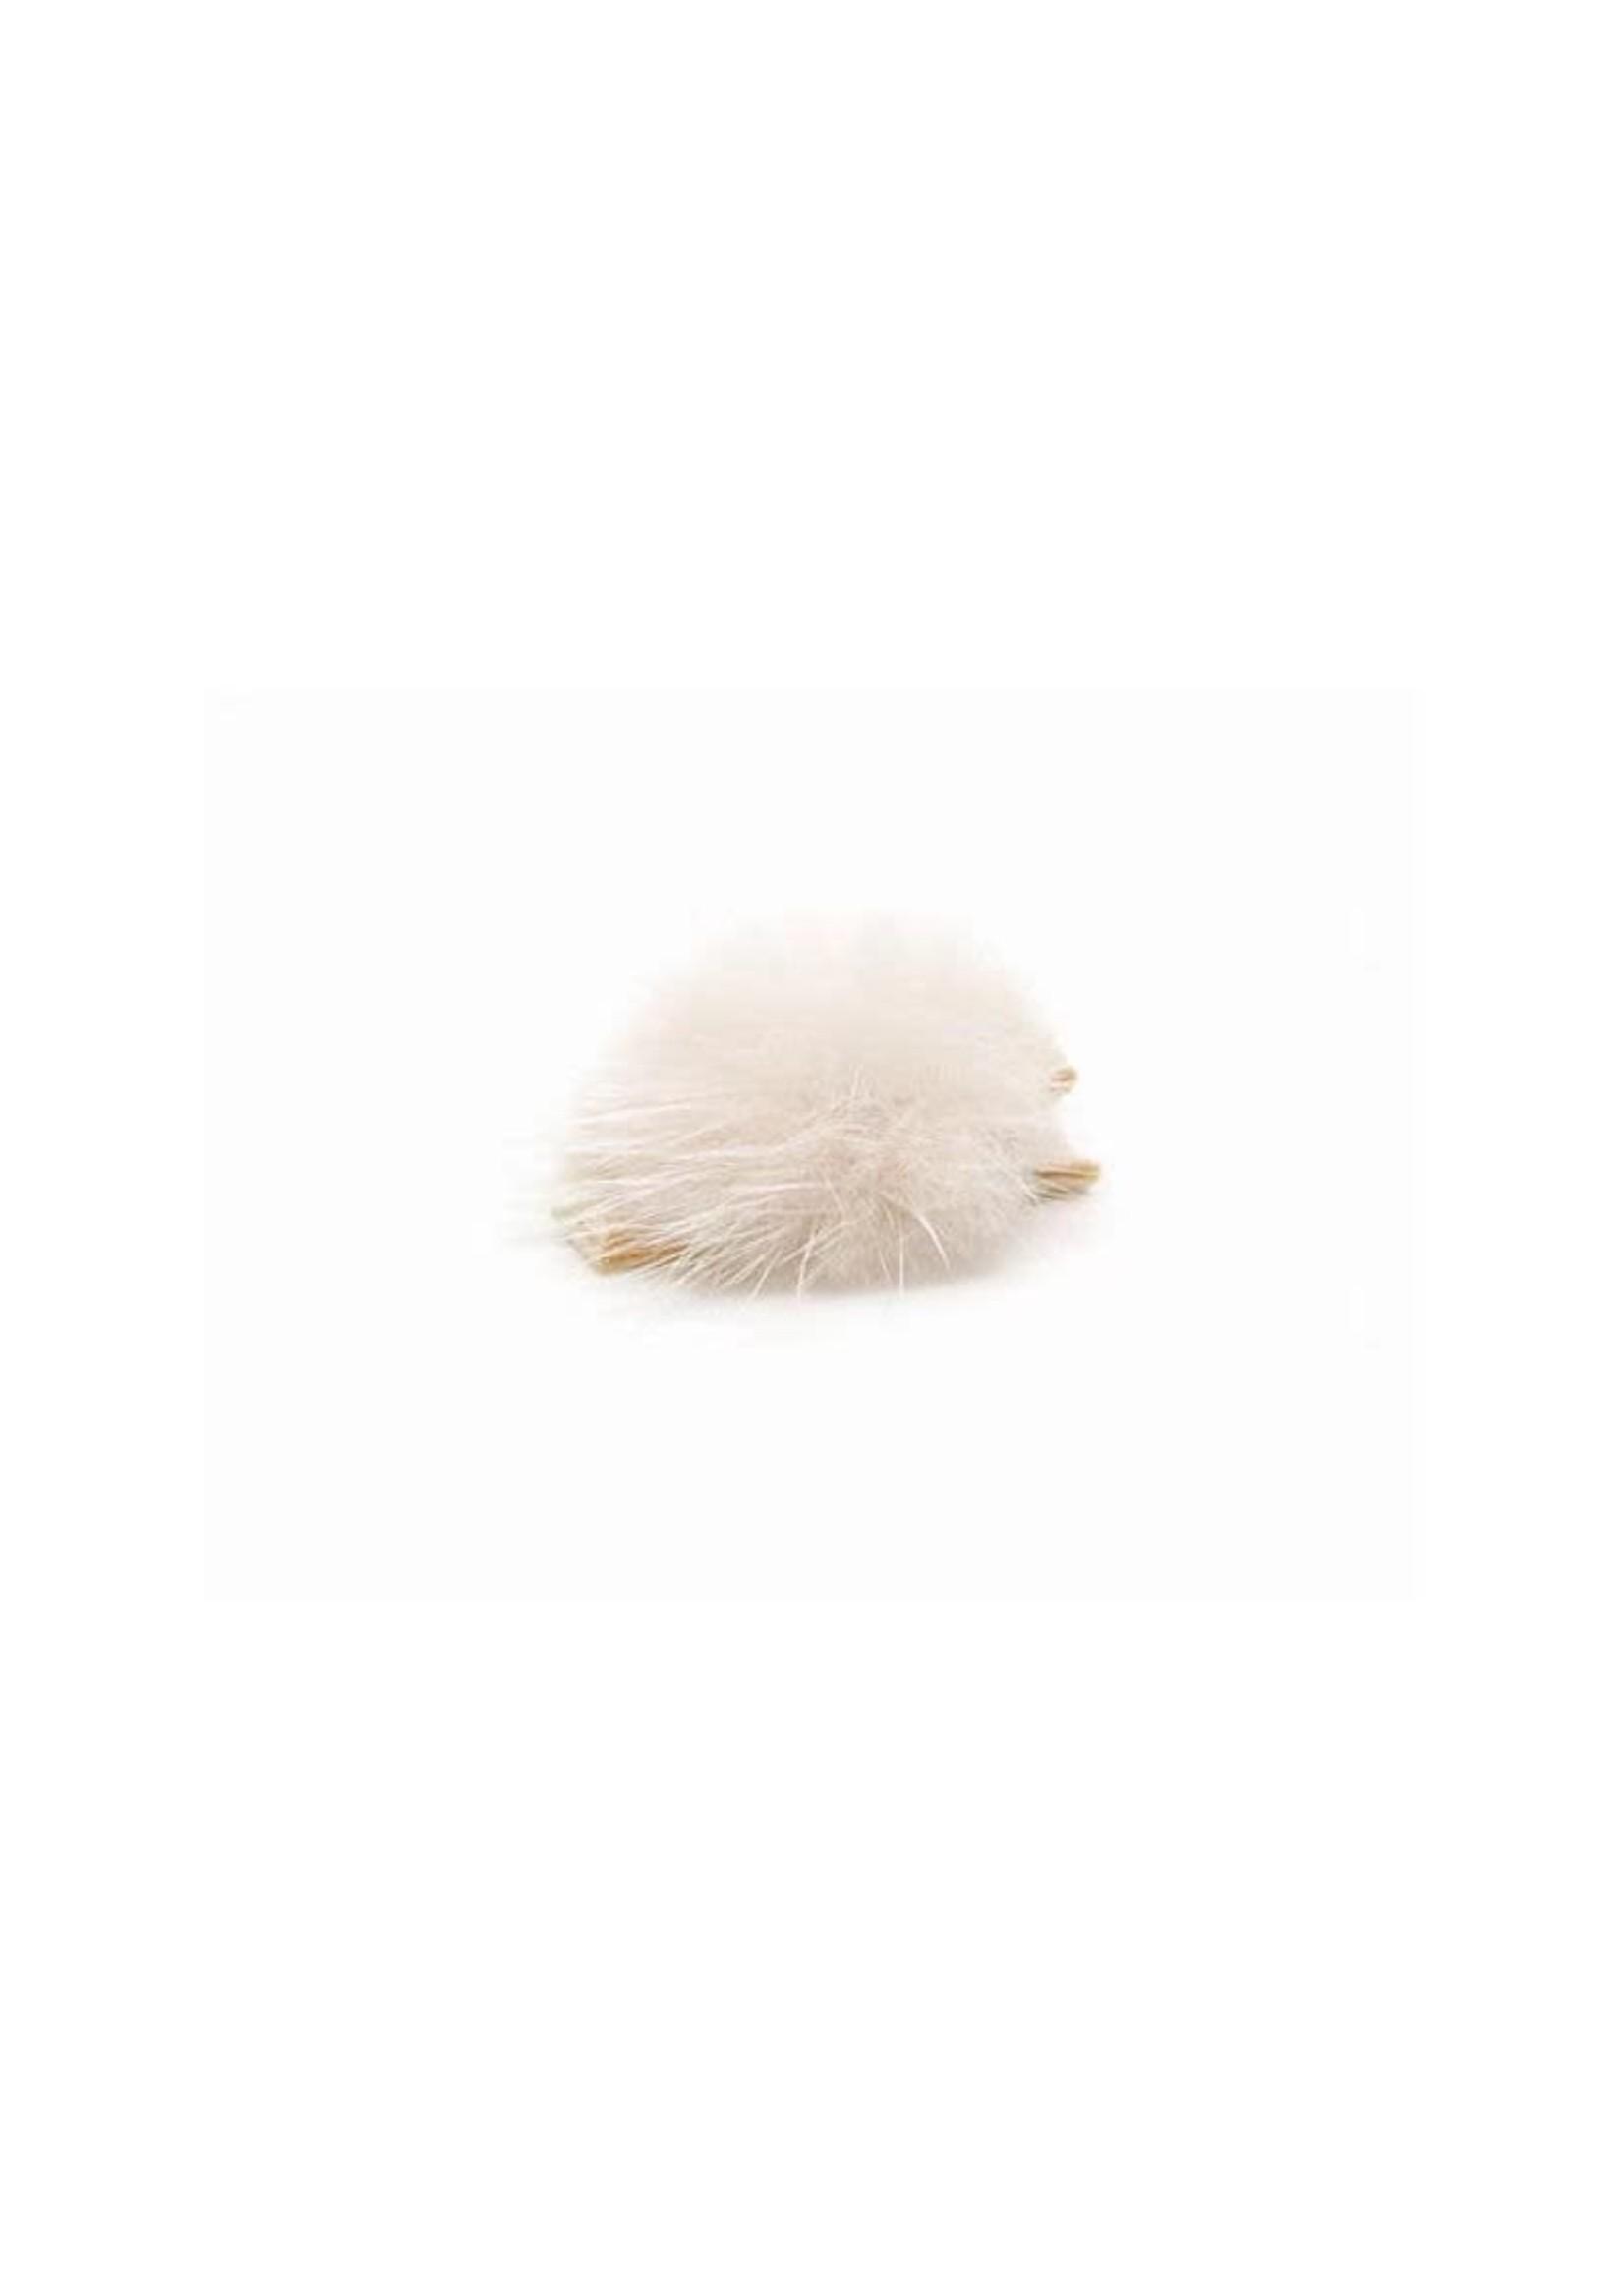 Olilia Small Mink Puff Hair Clip - Nude